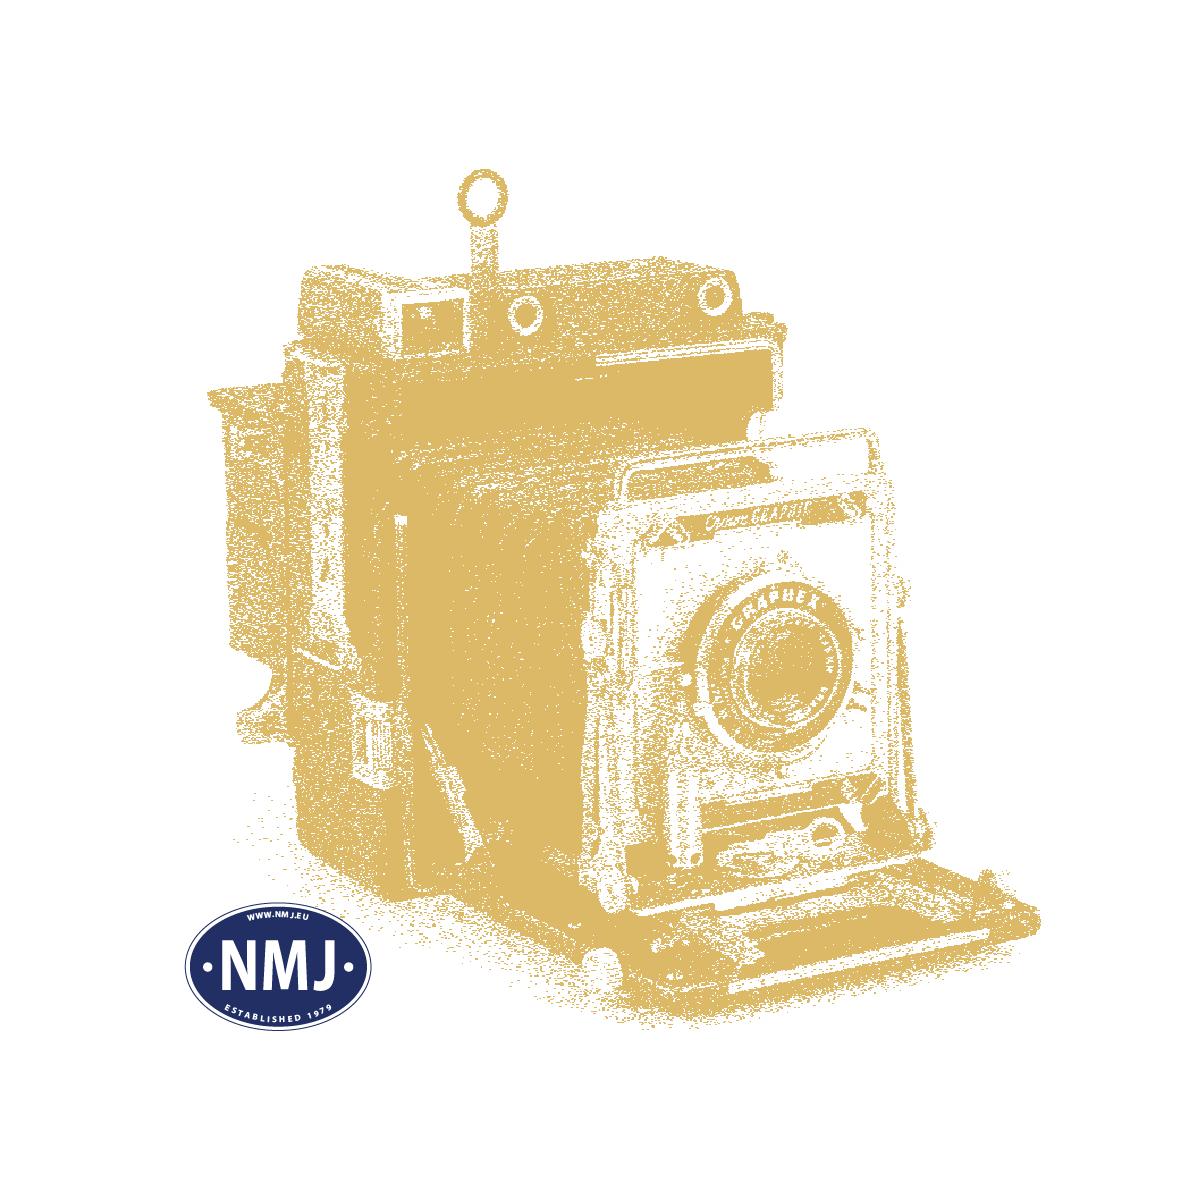 NMJT145004 - NMJ Topline der NSB Di3.643, Rot/Silber, DC Analog, Spür 0